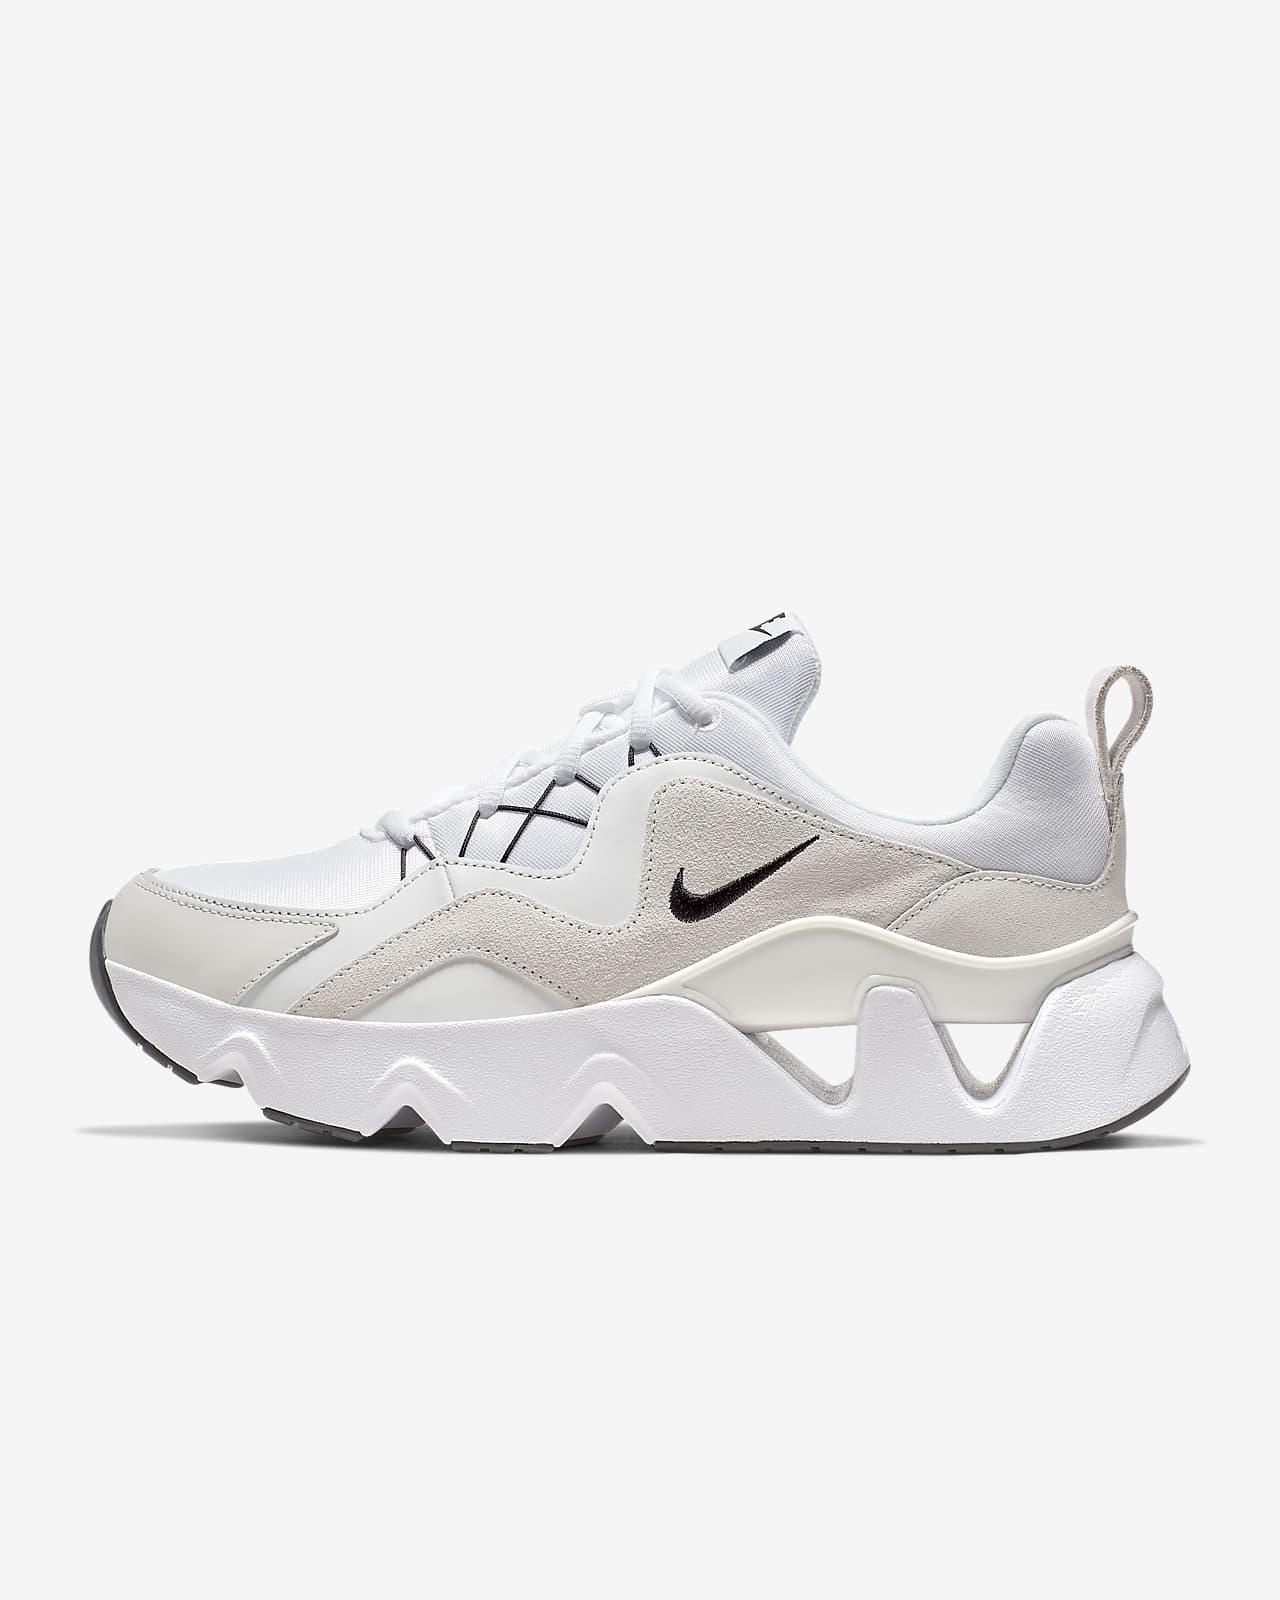 nike zapatillas mujer running blancas